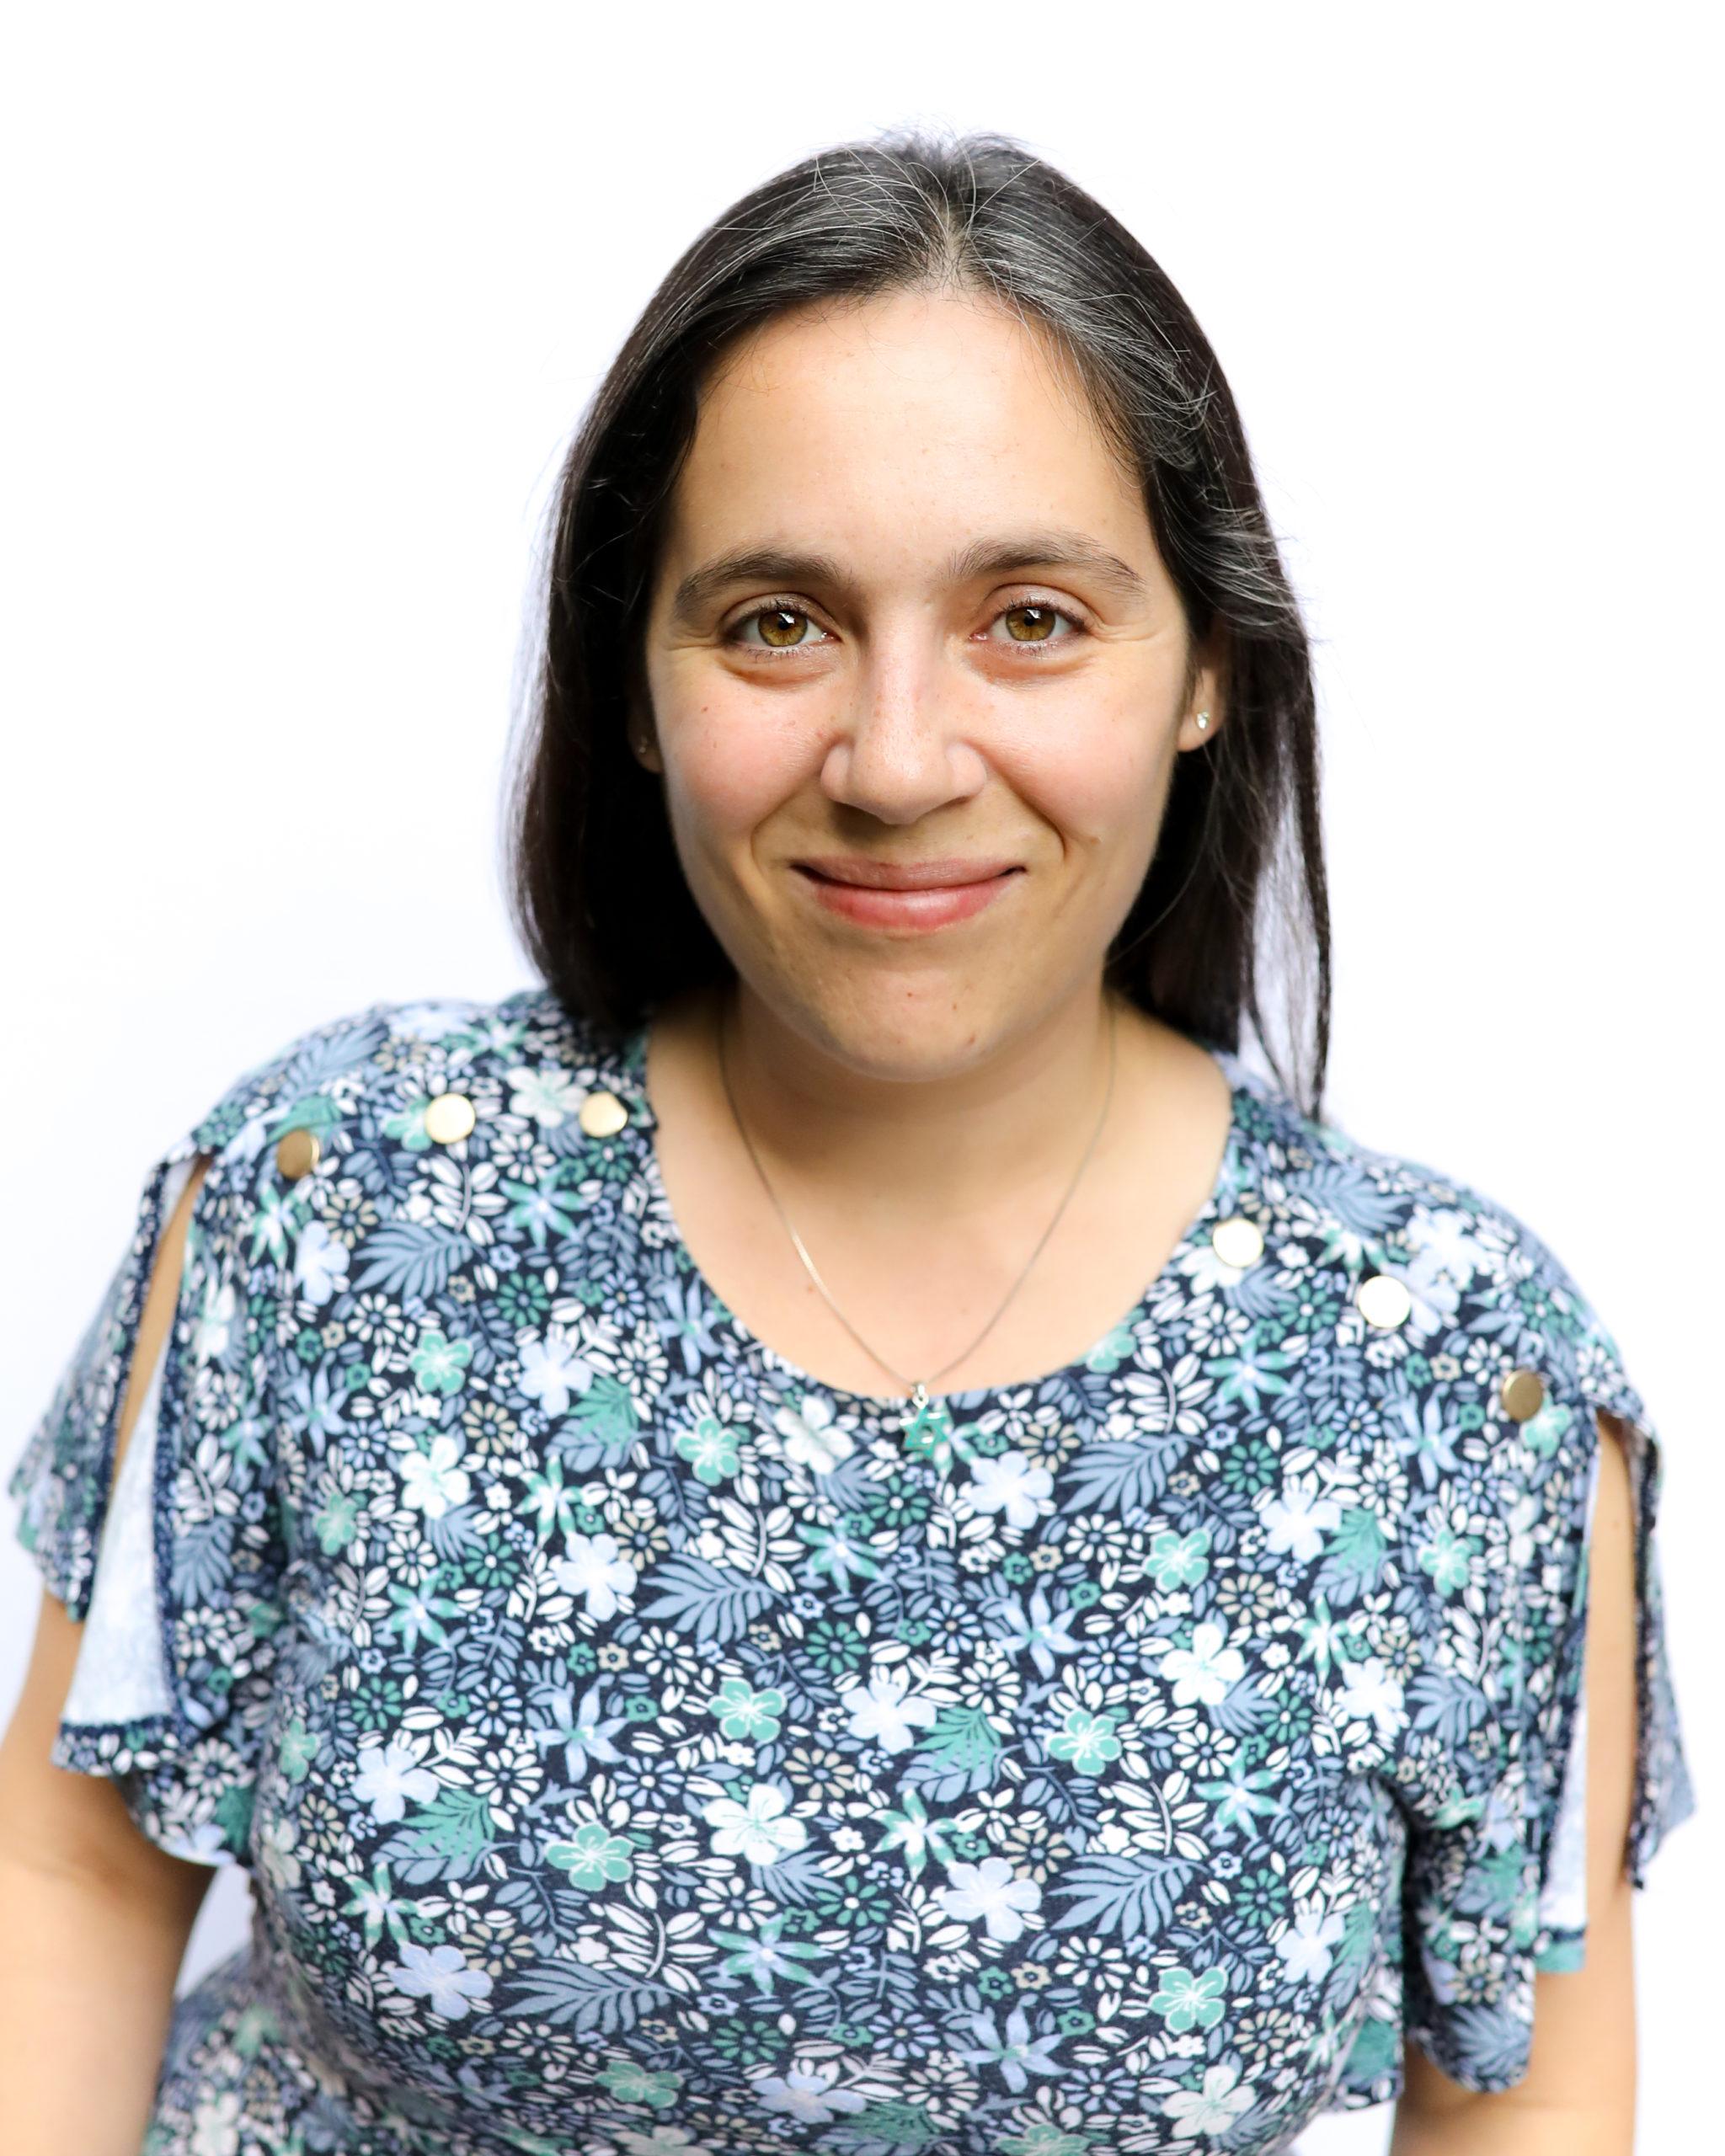 Emily Schoerning, PhD